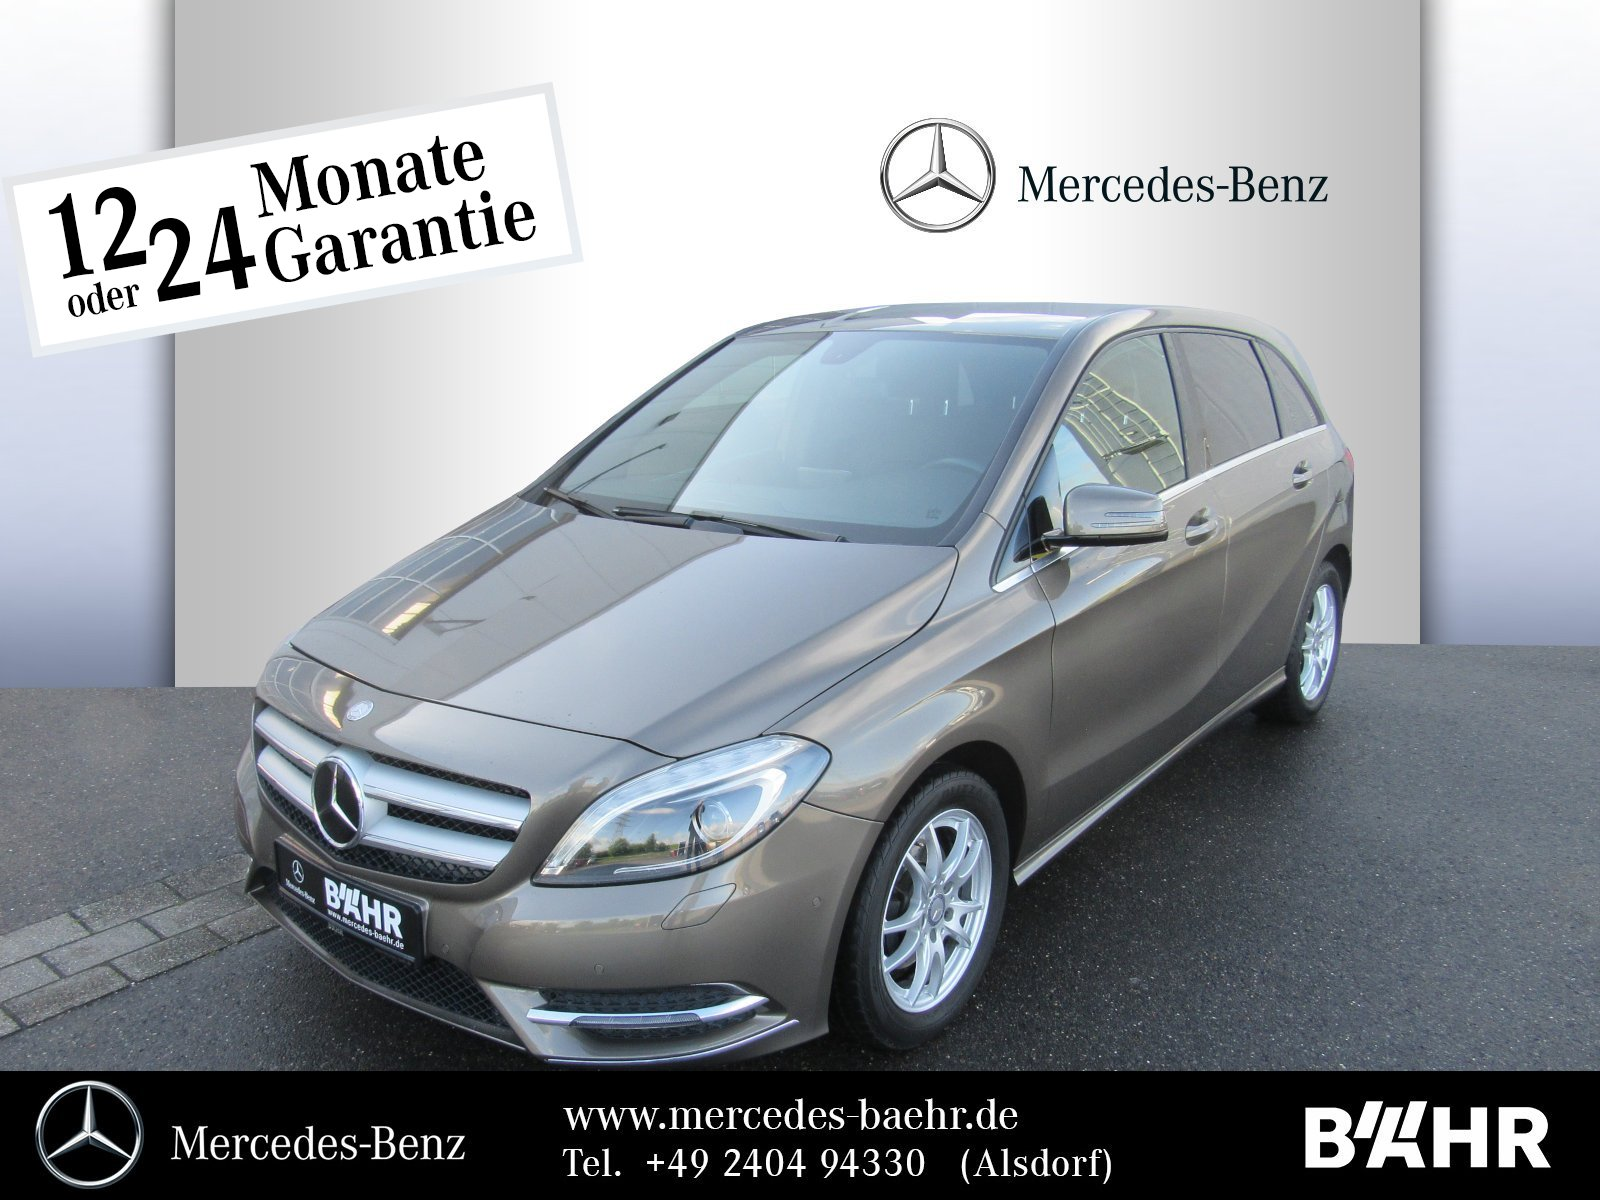 "Mercedes-Benz B 180 CDI Sport-Paket/Navi/BI-Xenon/RFK/LMR-17"", Jahr 2013, diesel"